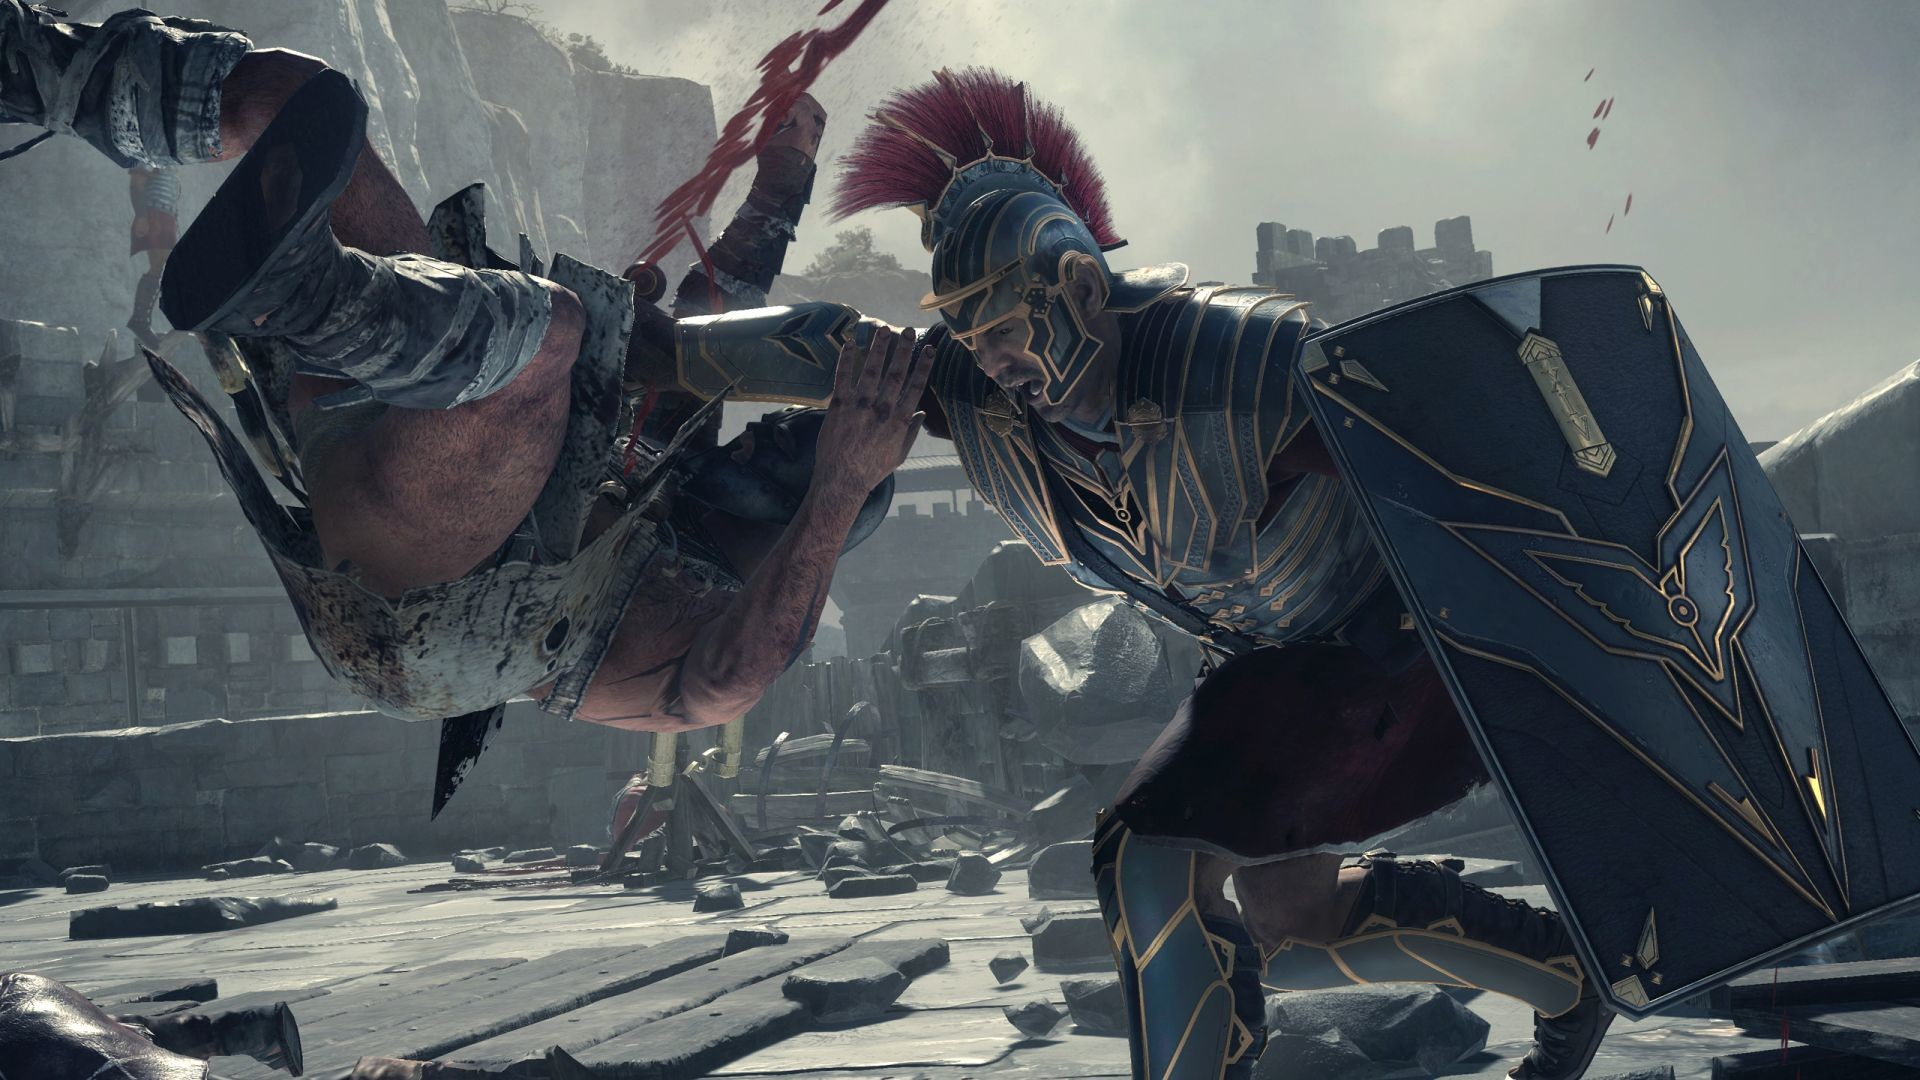 … wallpaper wallpapersafari; ryse son of rome fantasy roman game warrior  armor battle f …